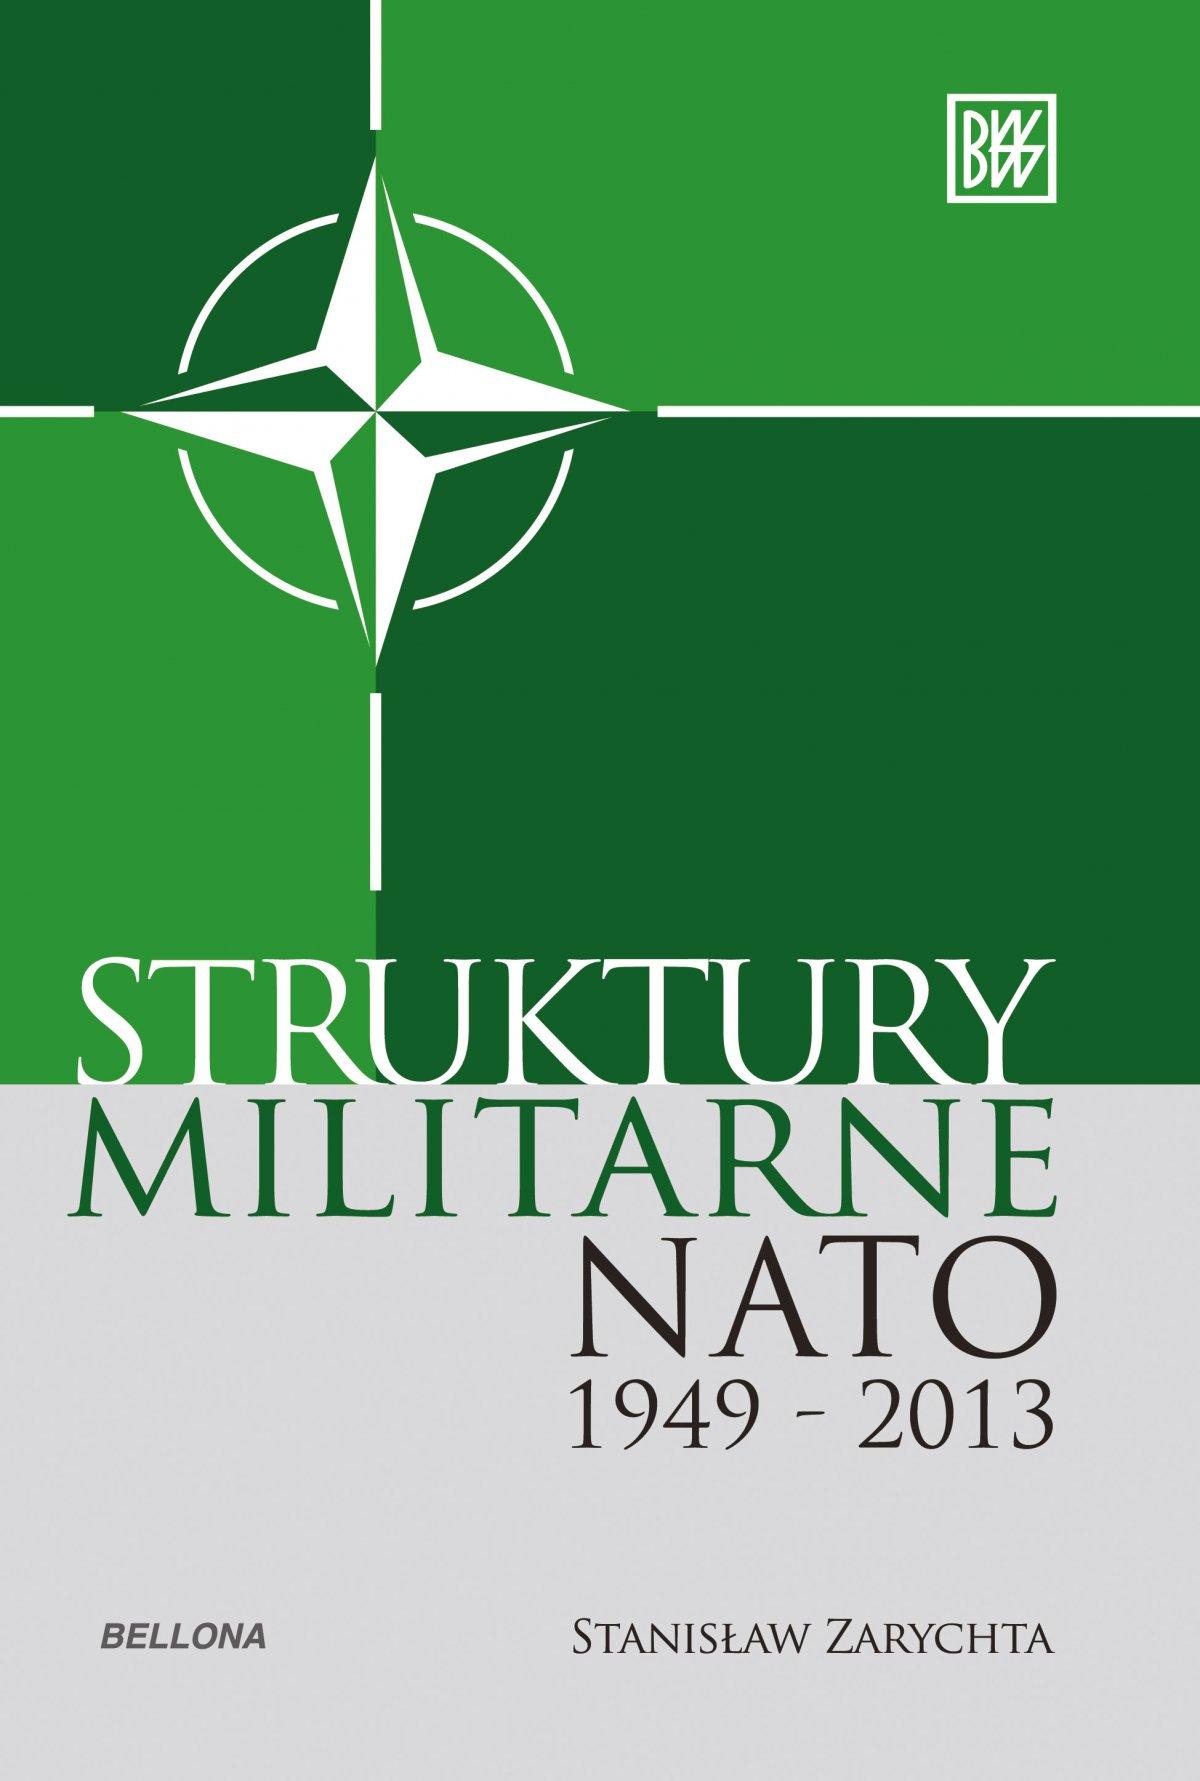 Struktury militarne NATO 1949-2013 - Ebook (Książka na Kindle) do pobrania w formacie MOBI